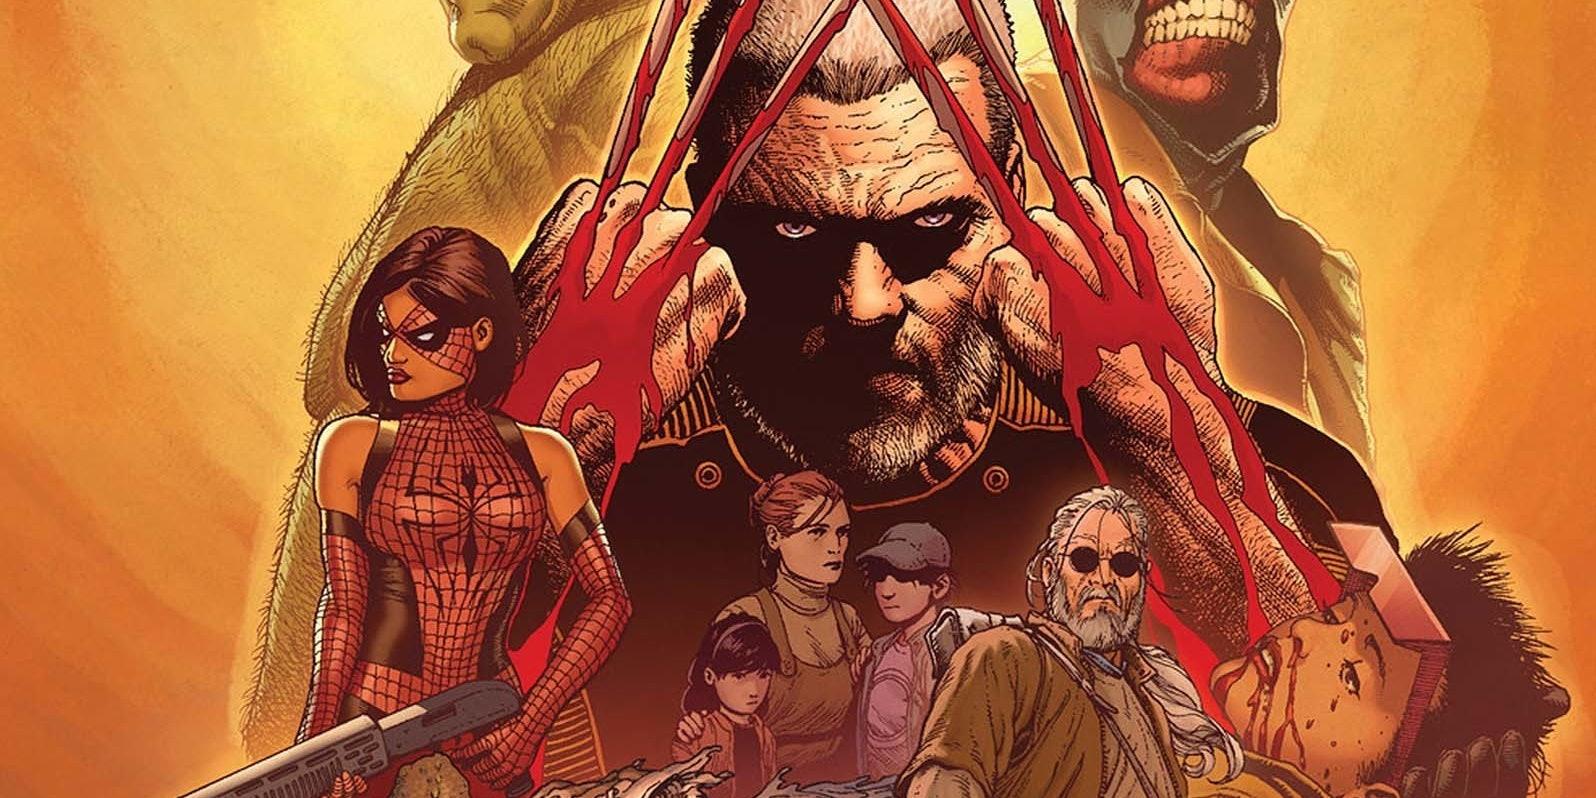 Wolverine 3 'Logan' Is a Hard-R Version of 'Old Man Logan'